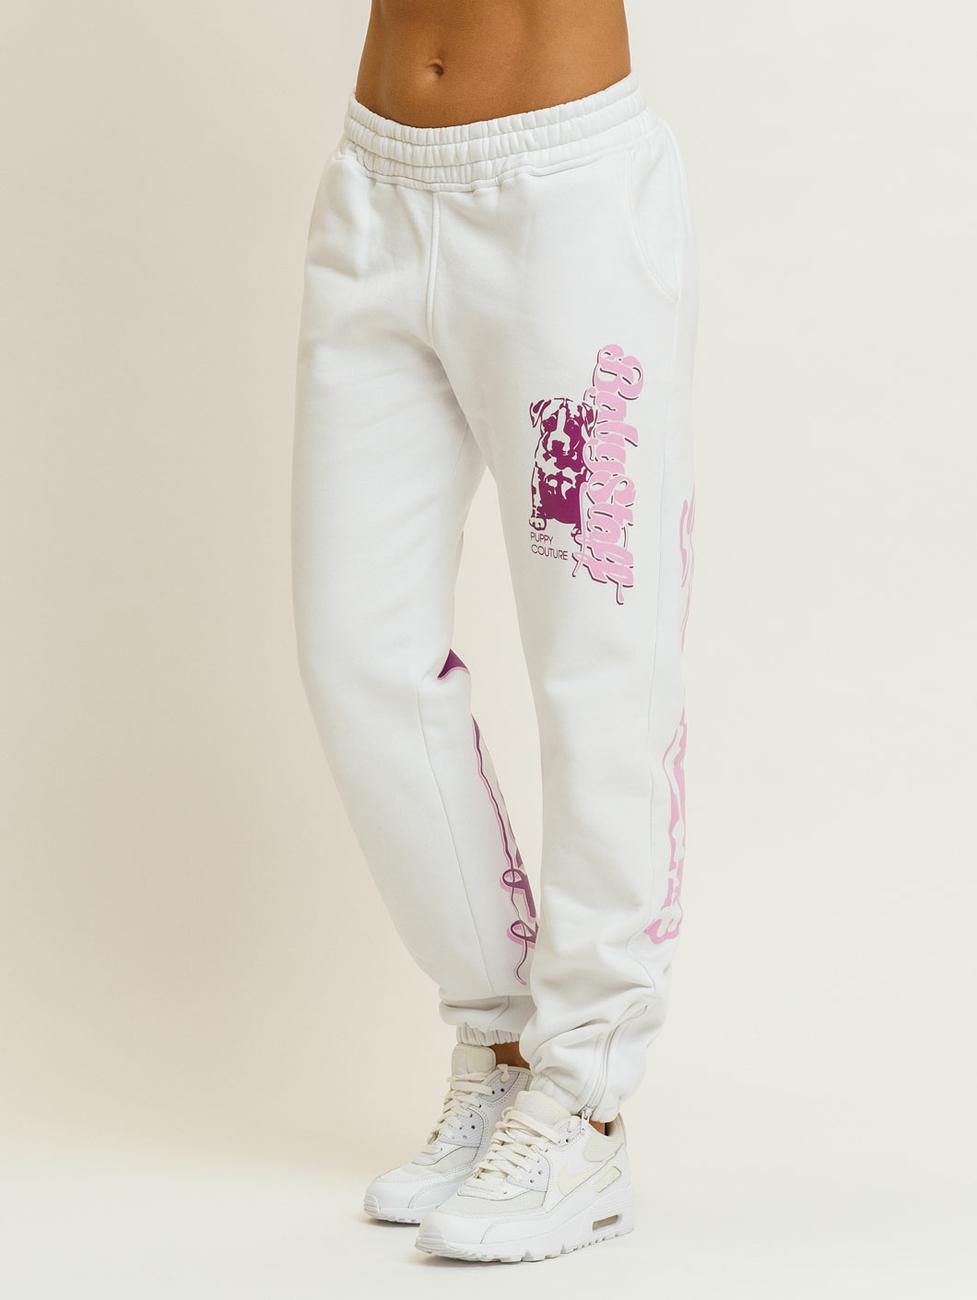 Babystaff Merah Sweatpants - weiss XL